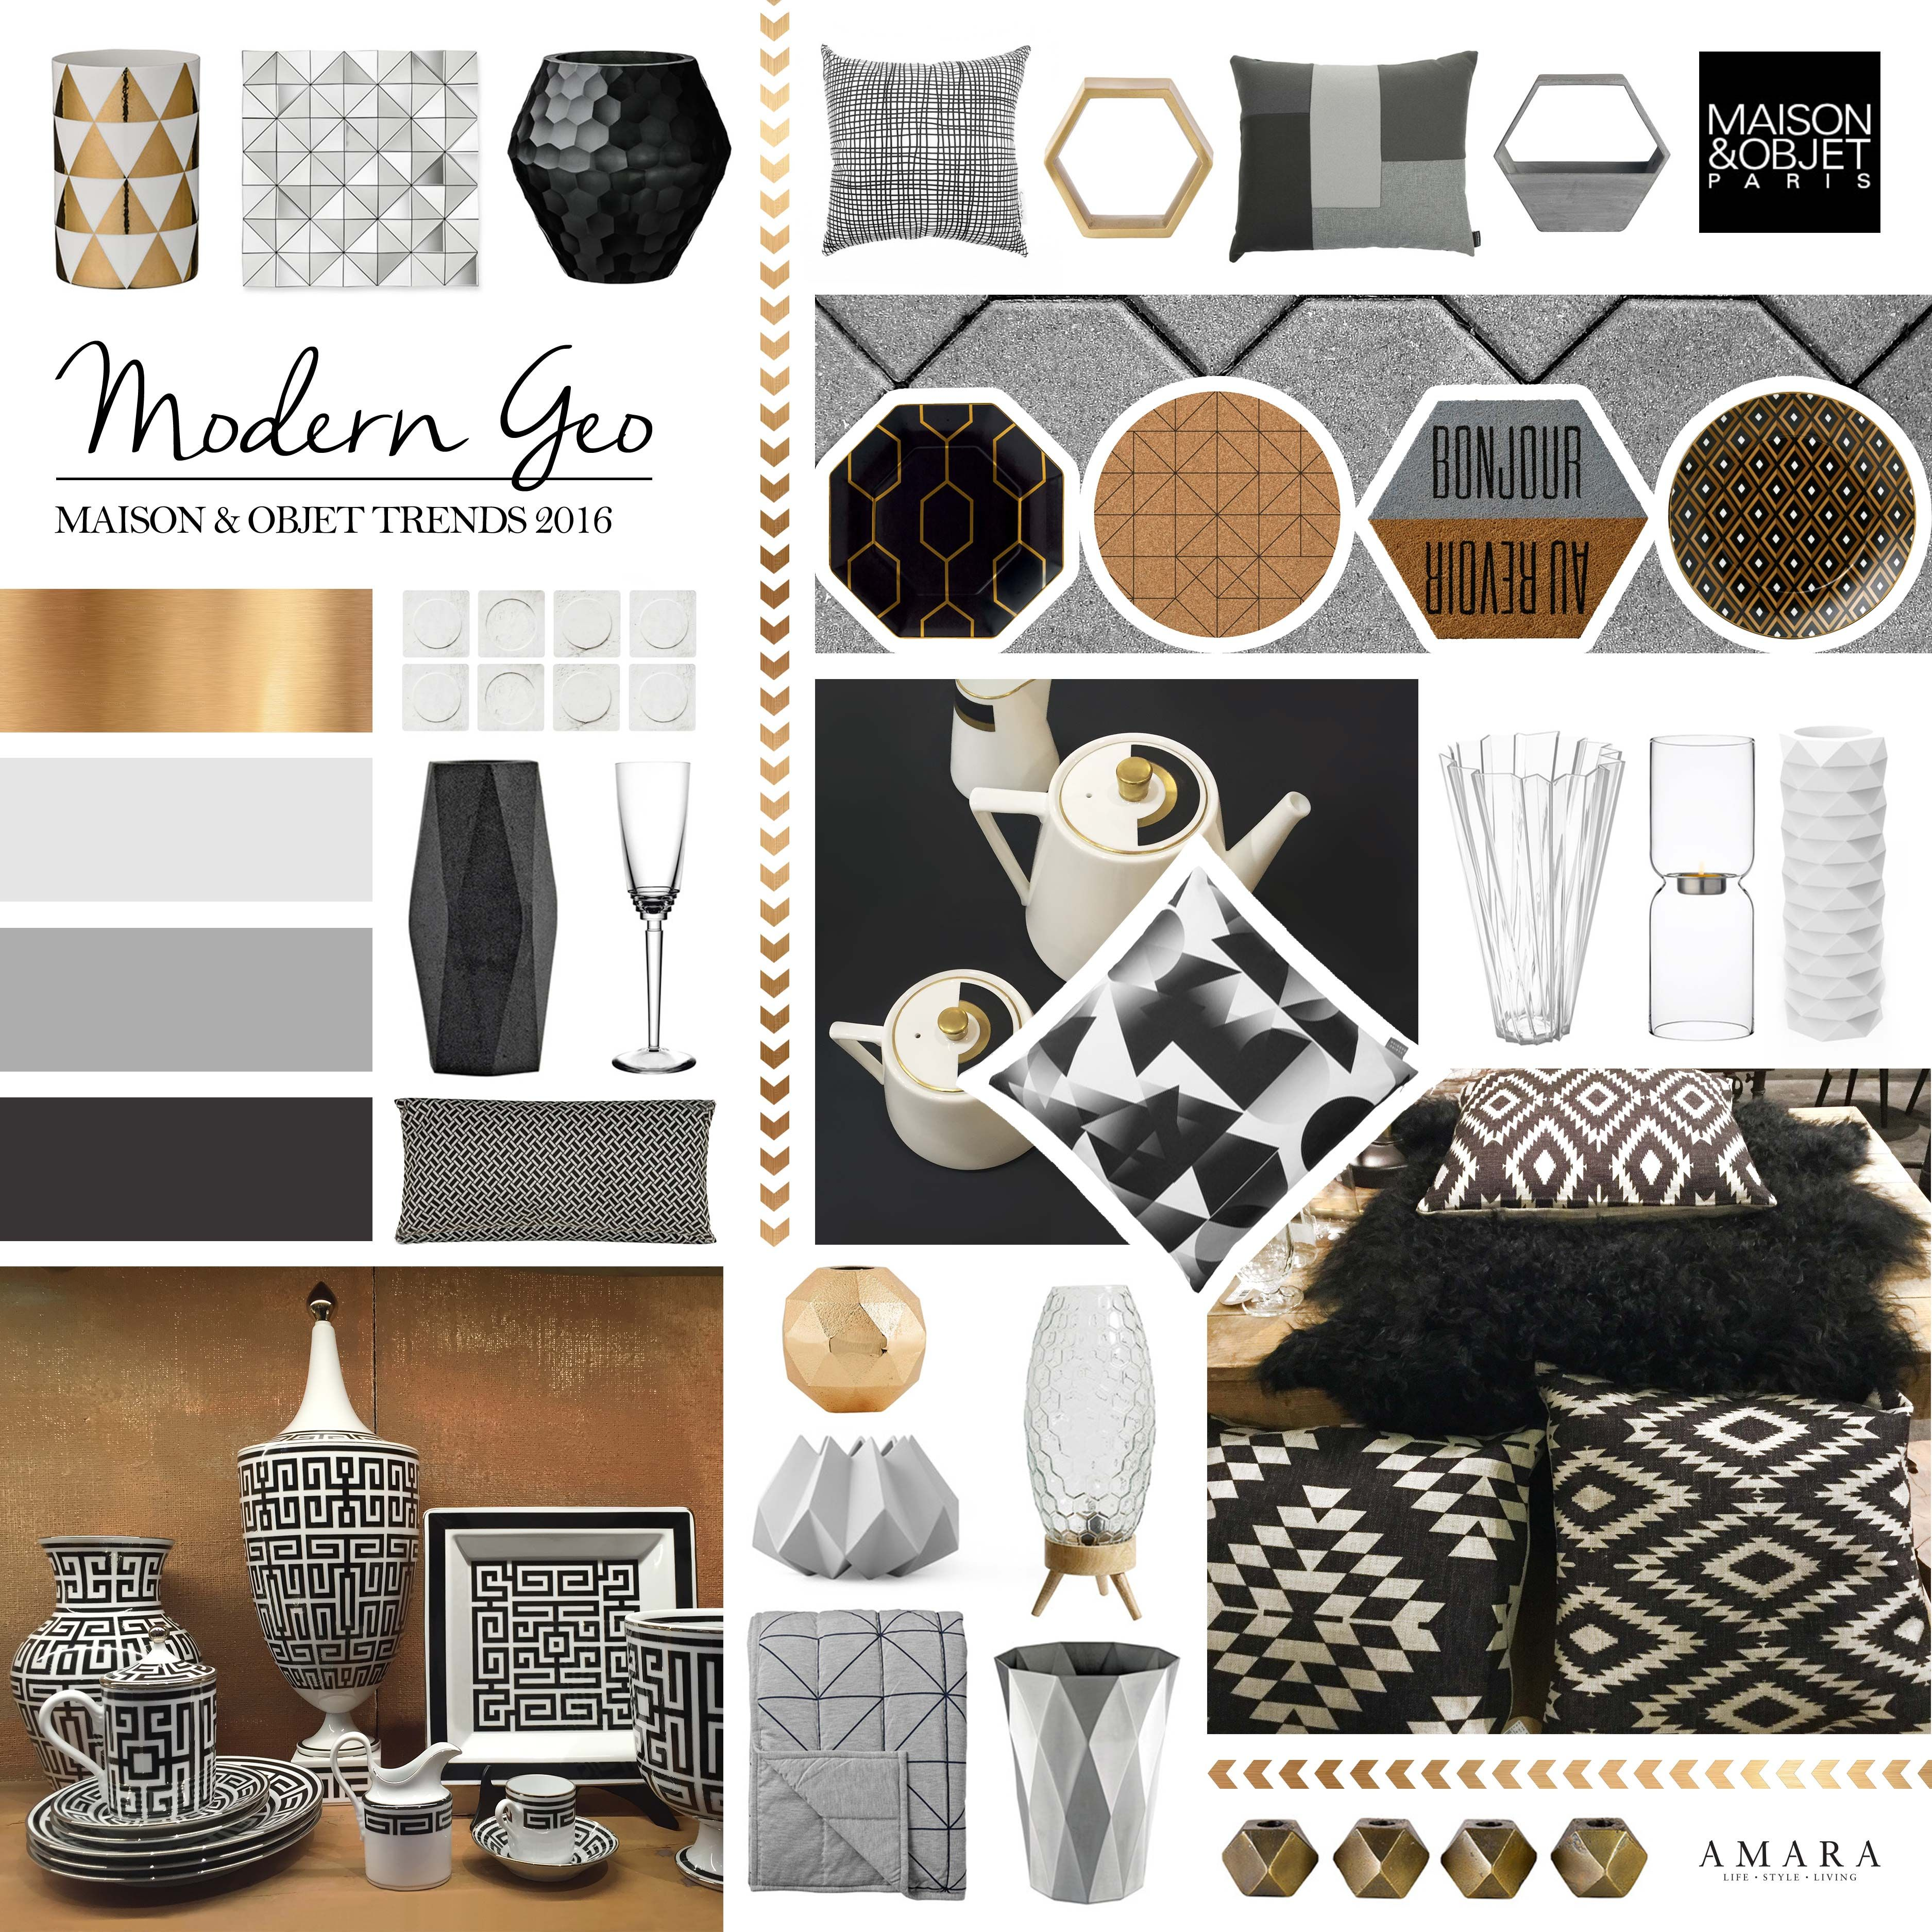 Maison Et Objet Interior Trend Report 2016 Decorating